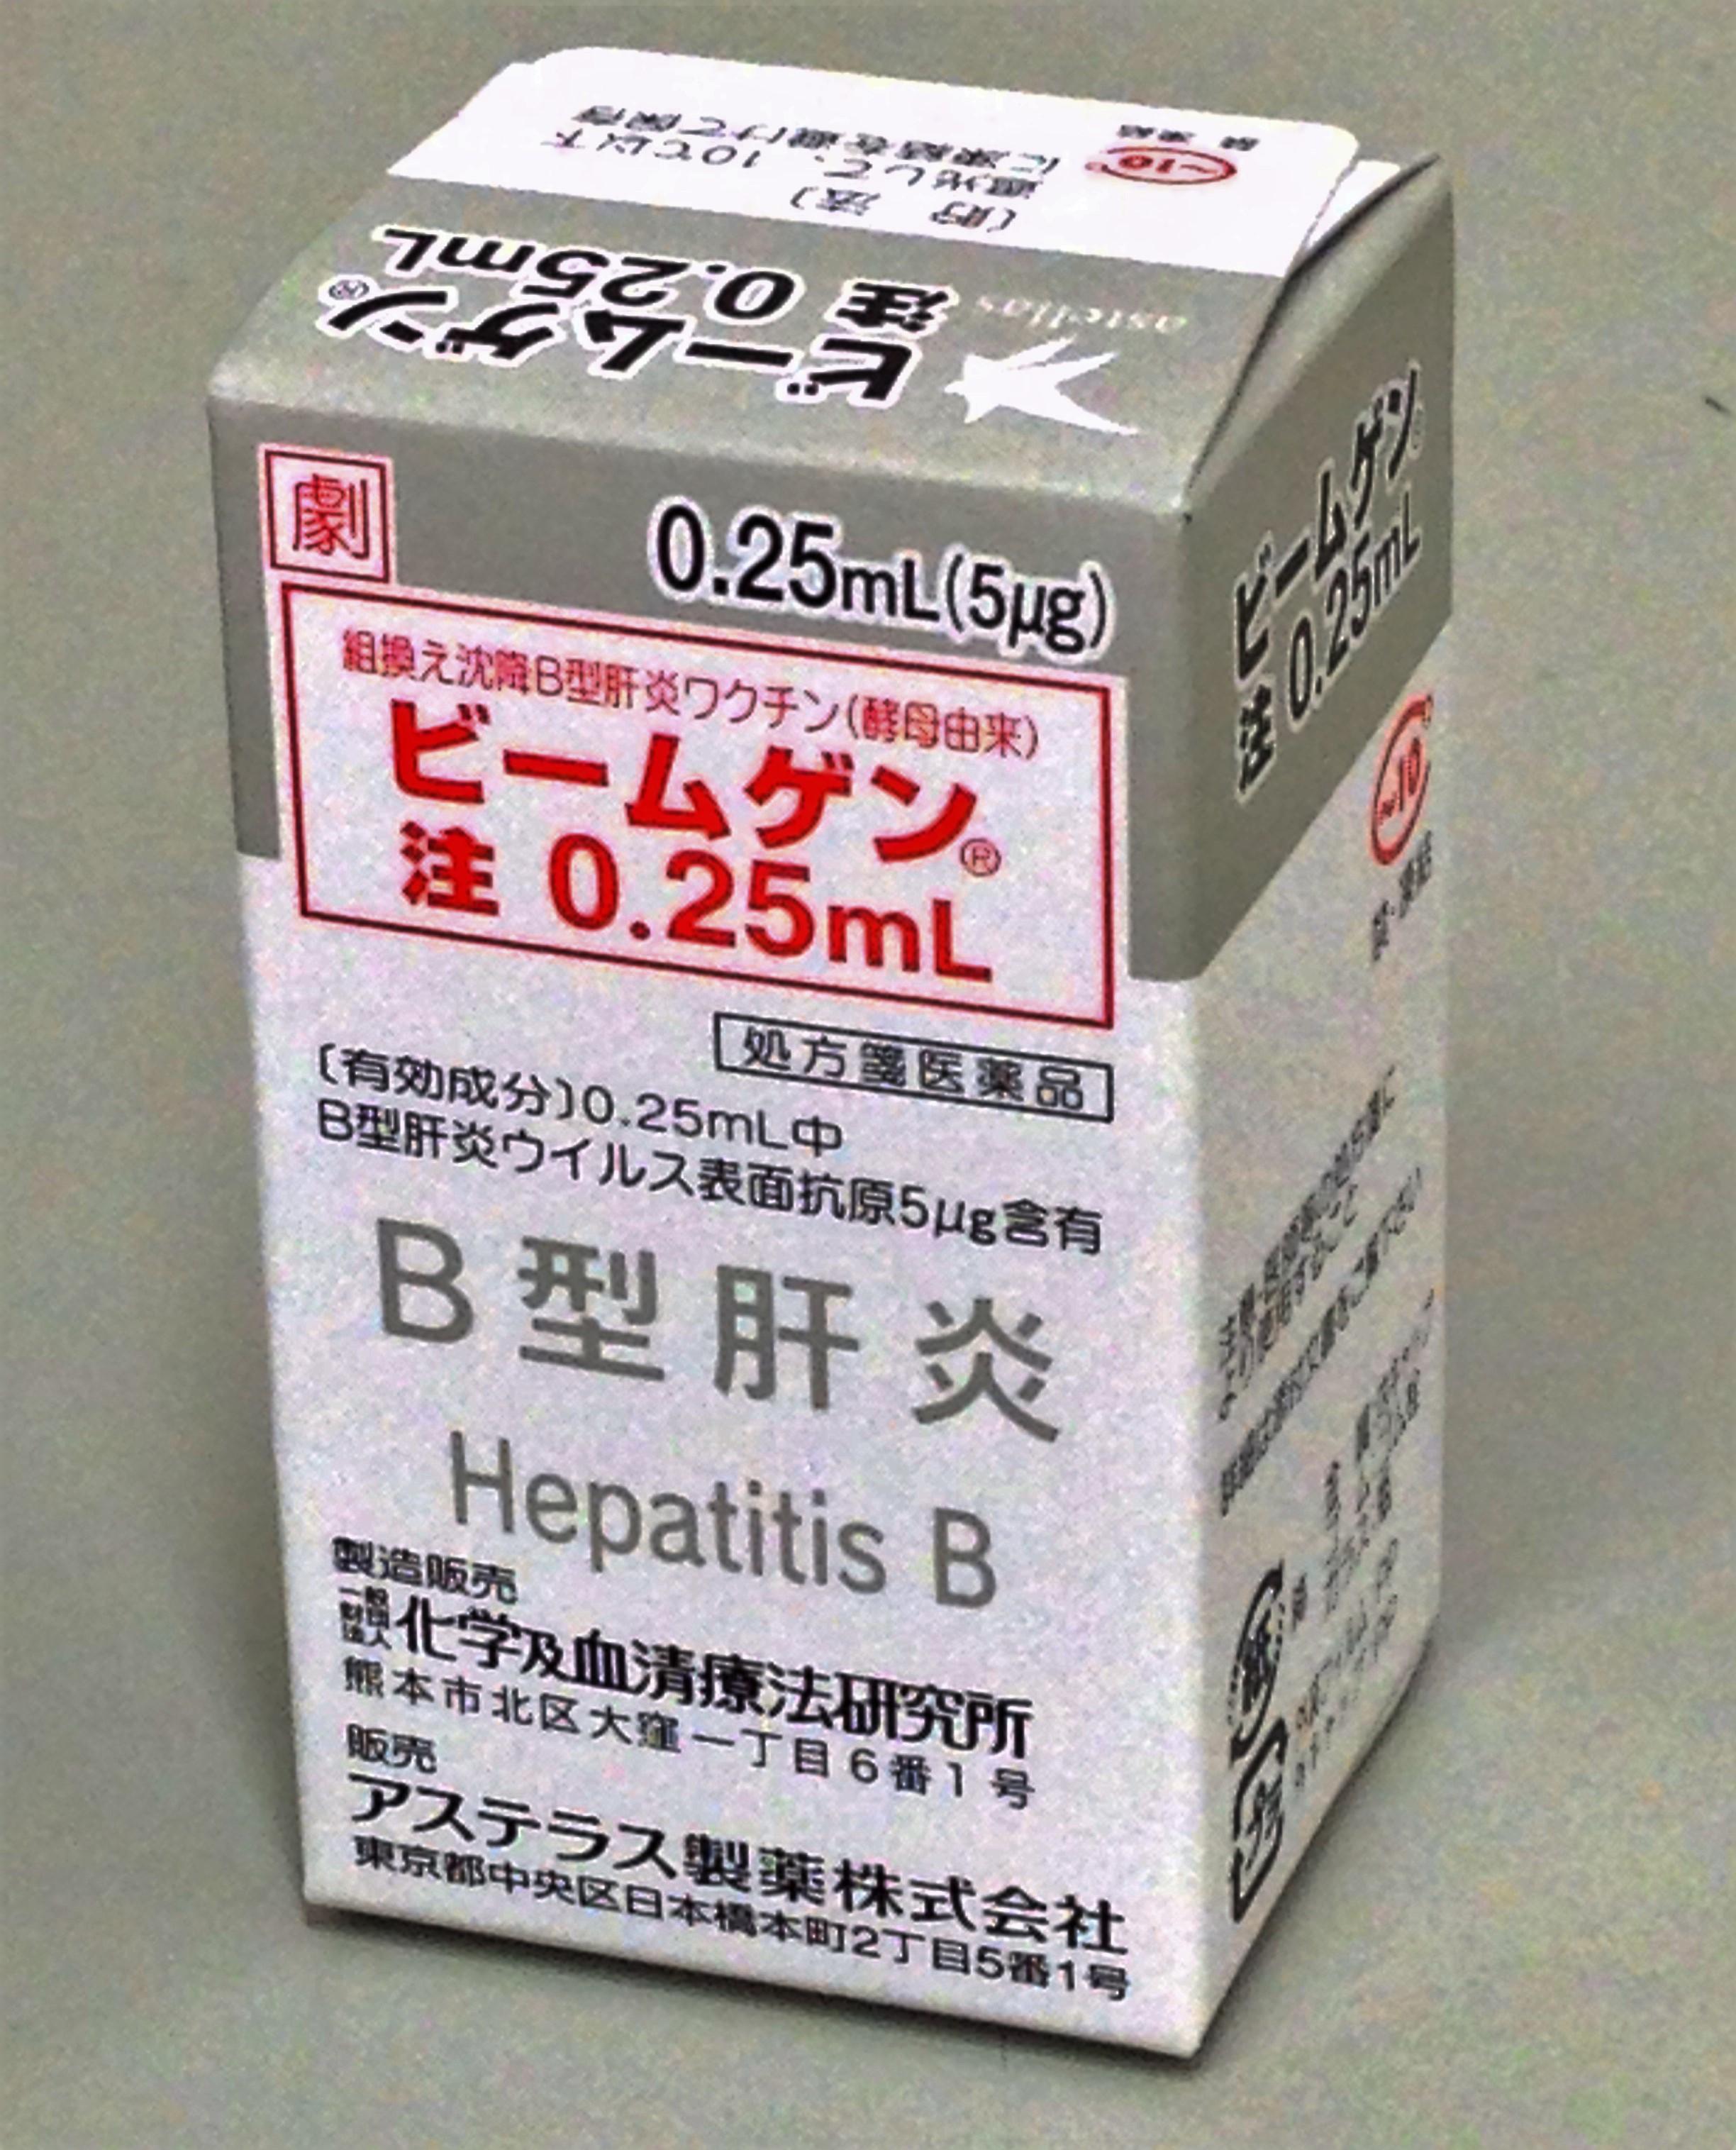 Papillomavirus vaccin nom - Papillomavirus origine du nom